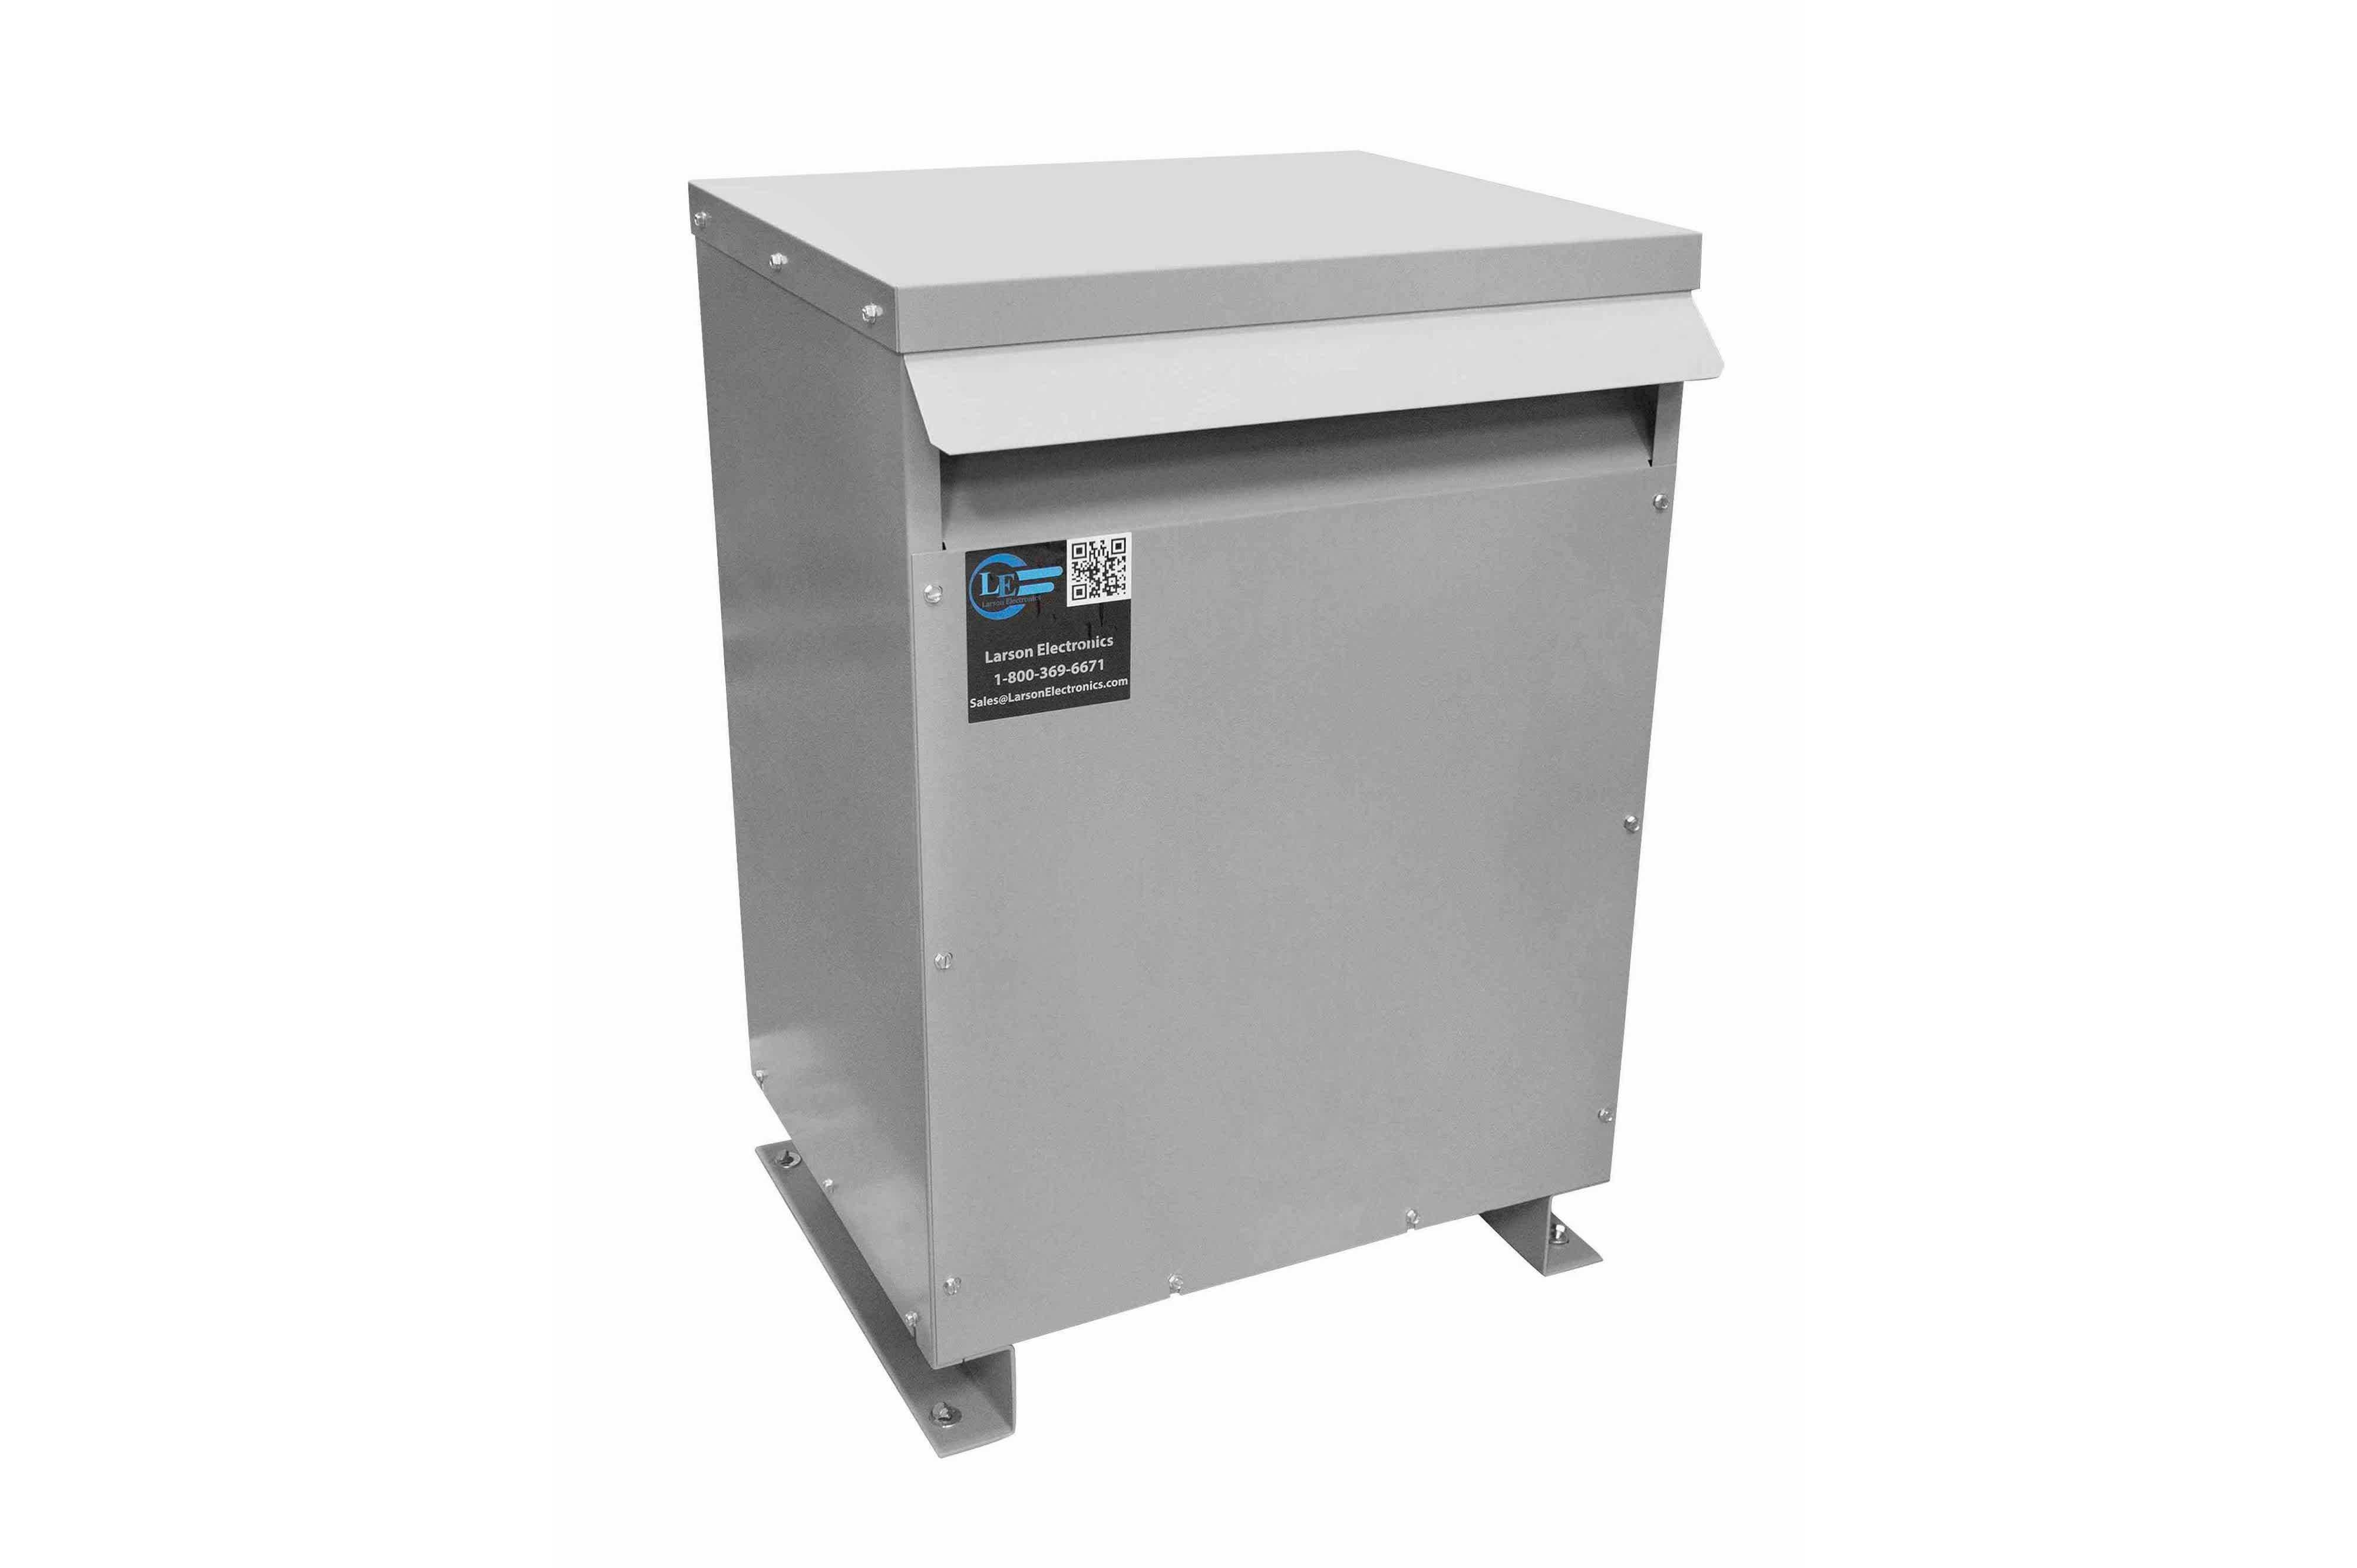 50 kVA 3PH Isolation Transformer, 600V Wye Primary, 240V Delta Secondary, N3R, Ventilated, 60 Hz